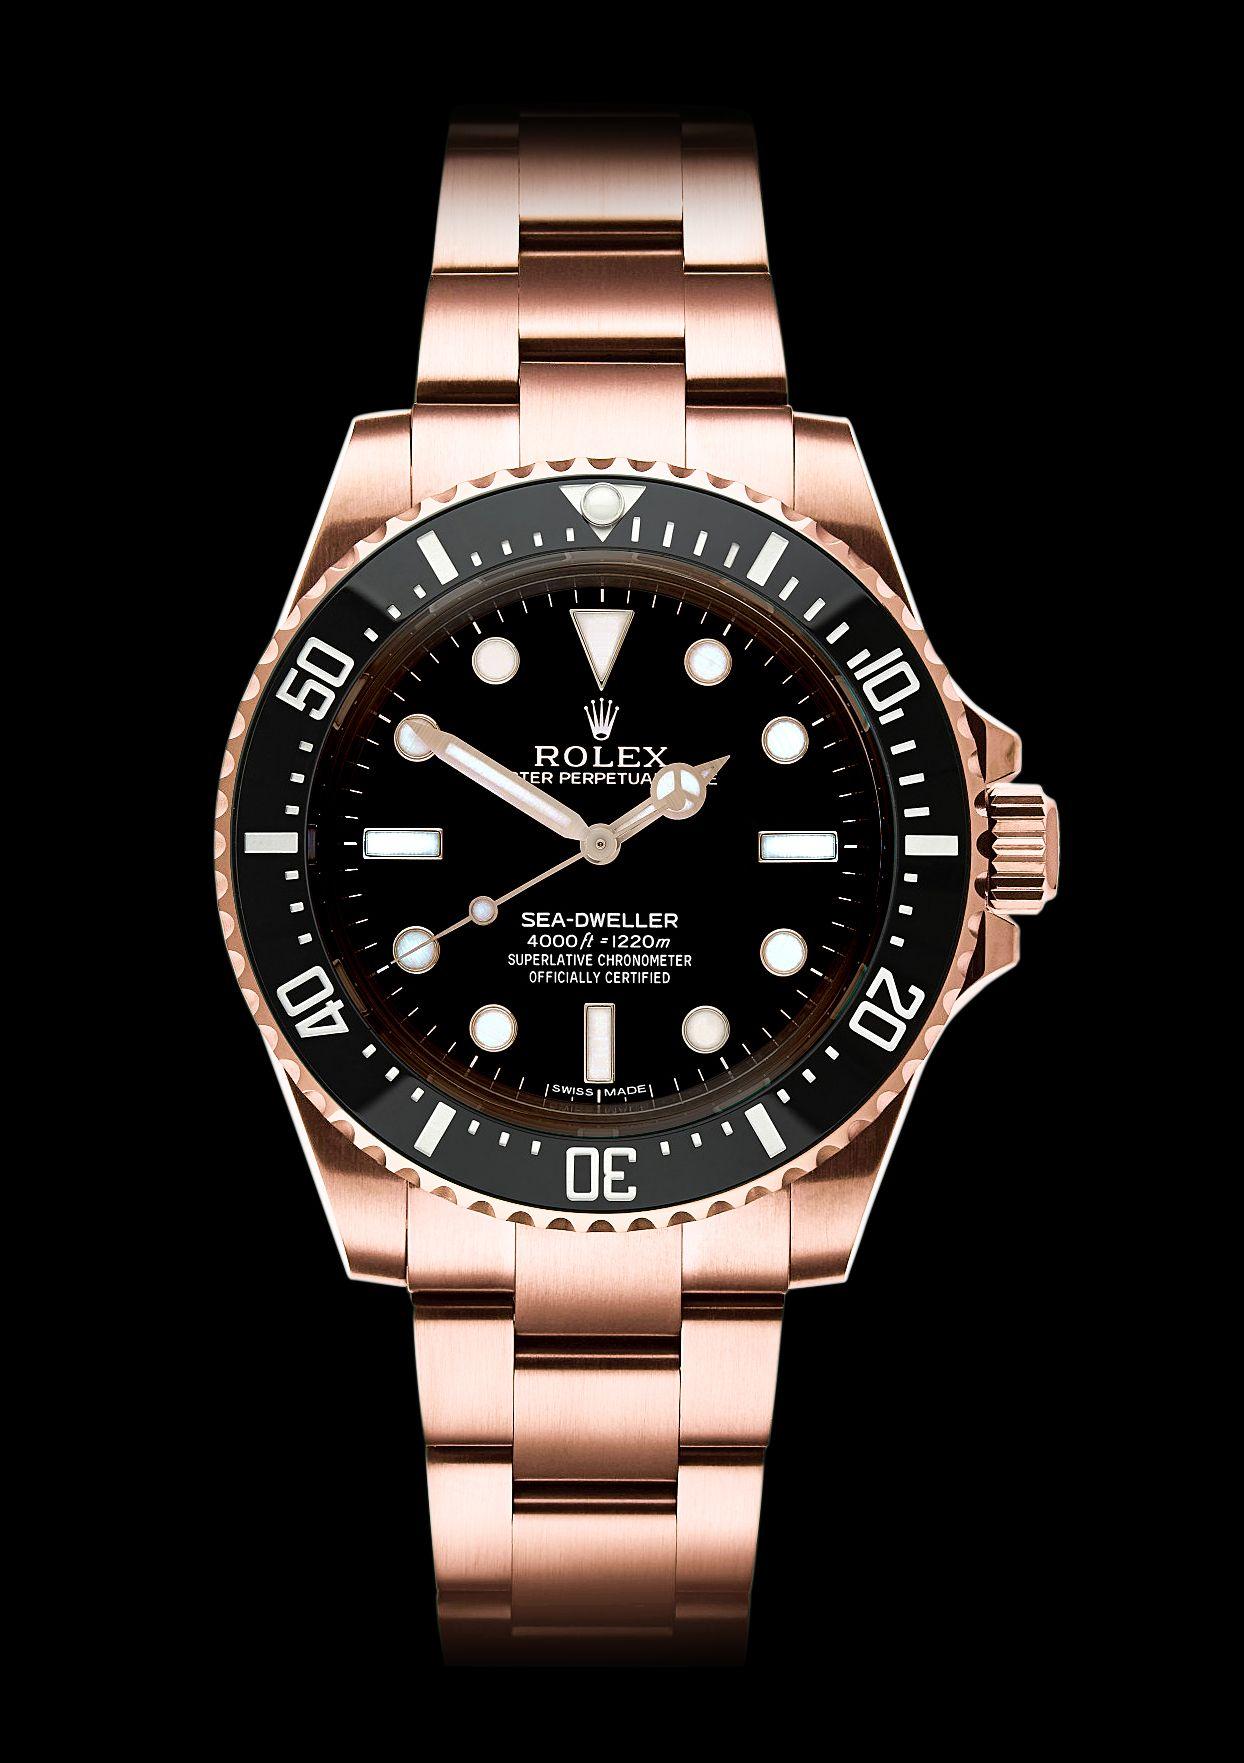 Rolex Sea,Dweller 4000, no date, Rose Gold. By designer